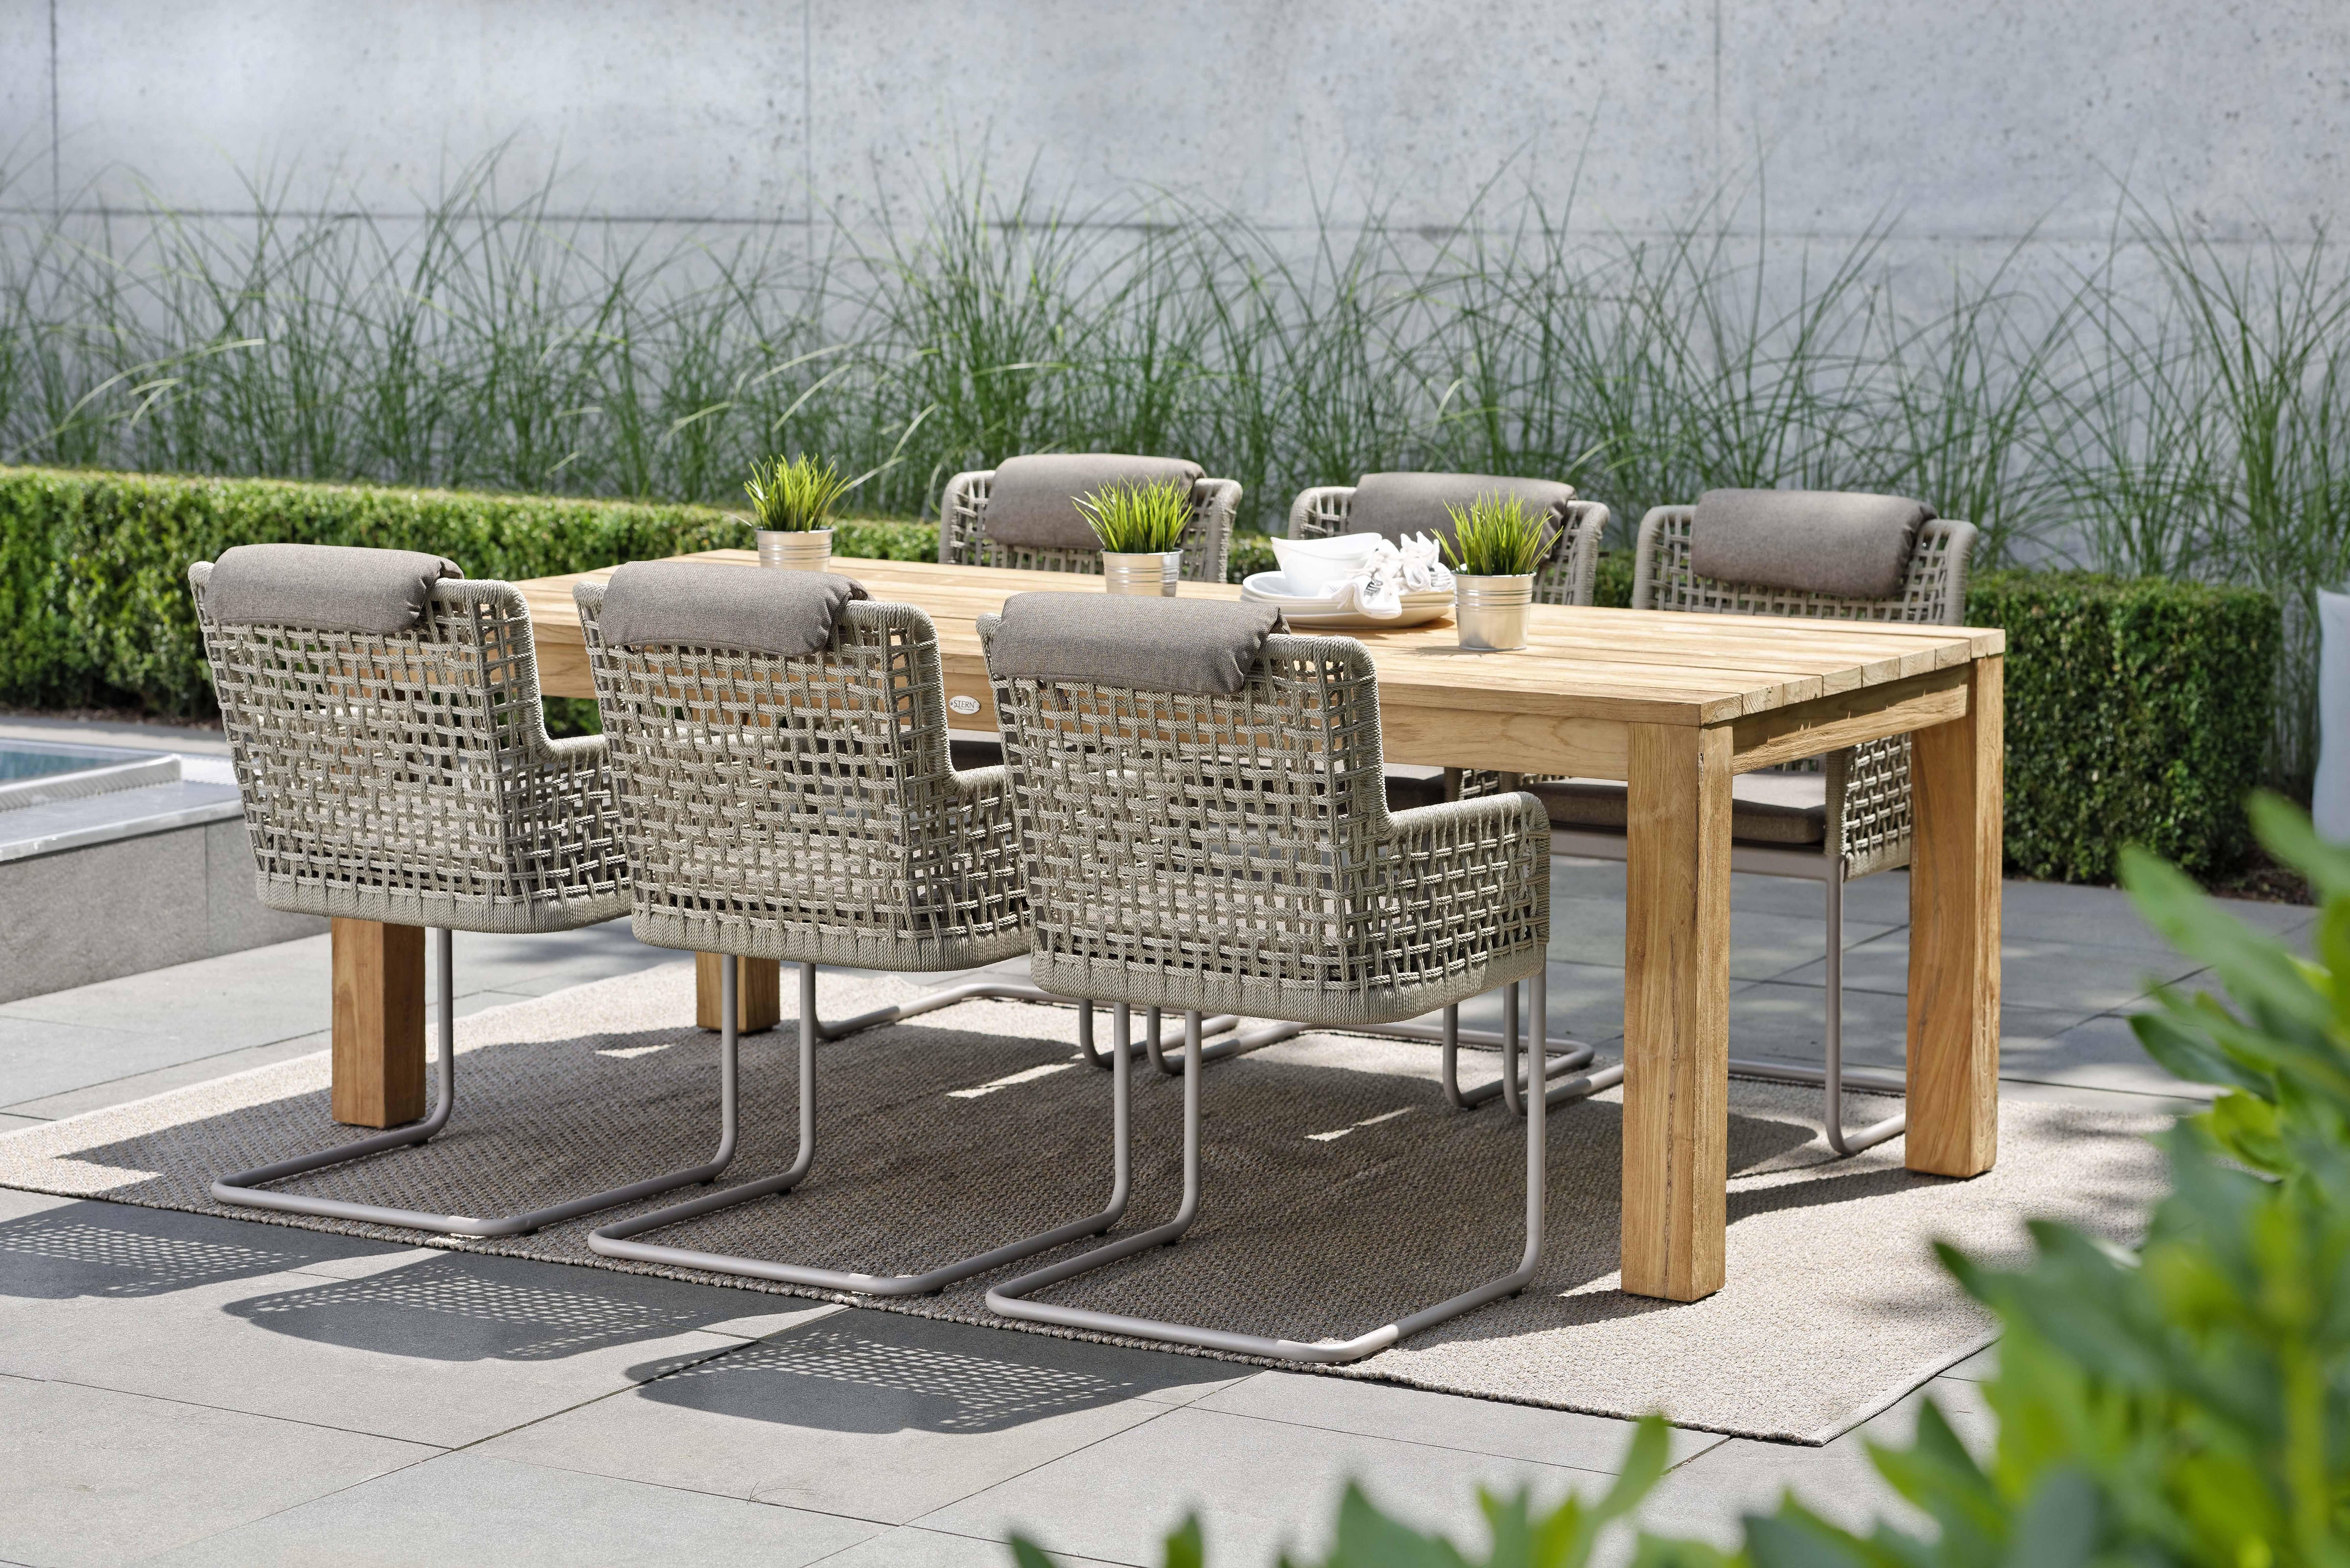 blumenhof rosenberger gmbh wetzlar gartenmoebel. Black Bedroom Furniture Sets. Home Design Ideas